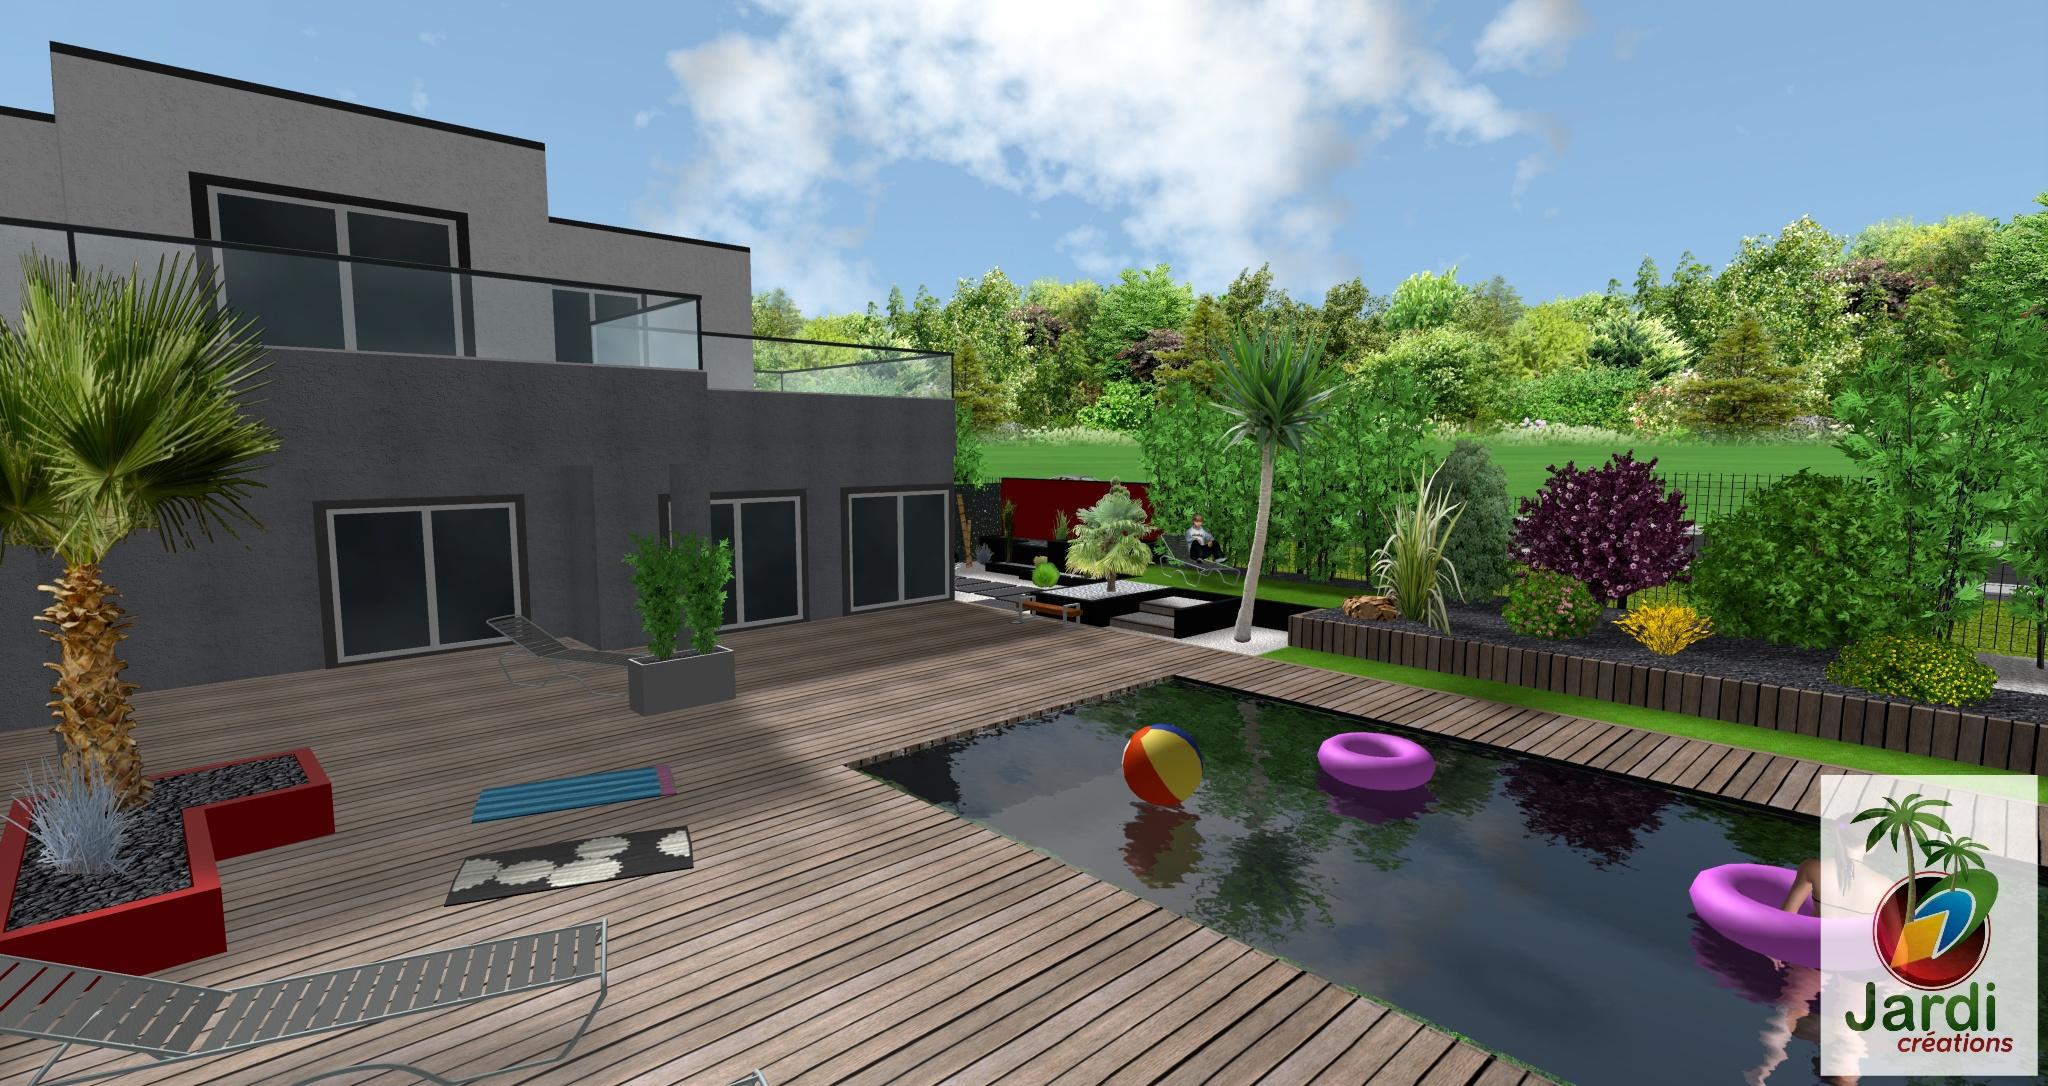 jardi cr ations architectes aigrefeuille sur maine france t l 0240043. Black Bedroom Furniture Sets. Home Design Ideas